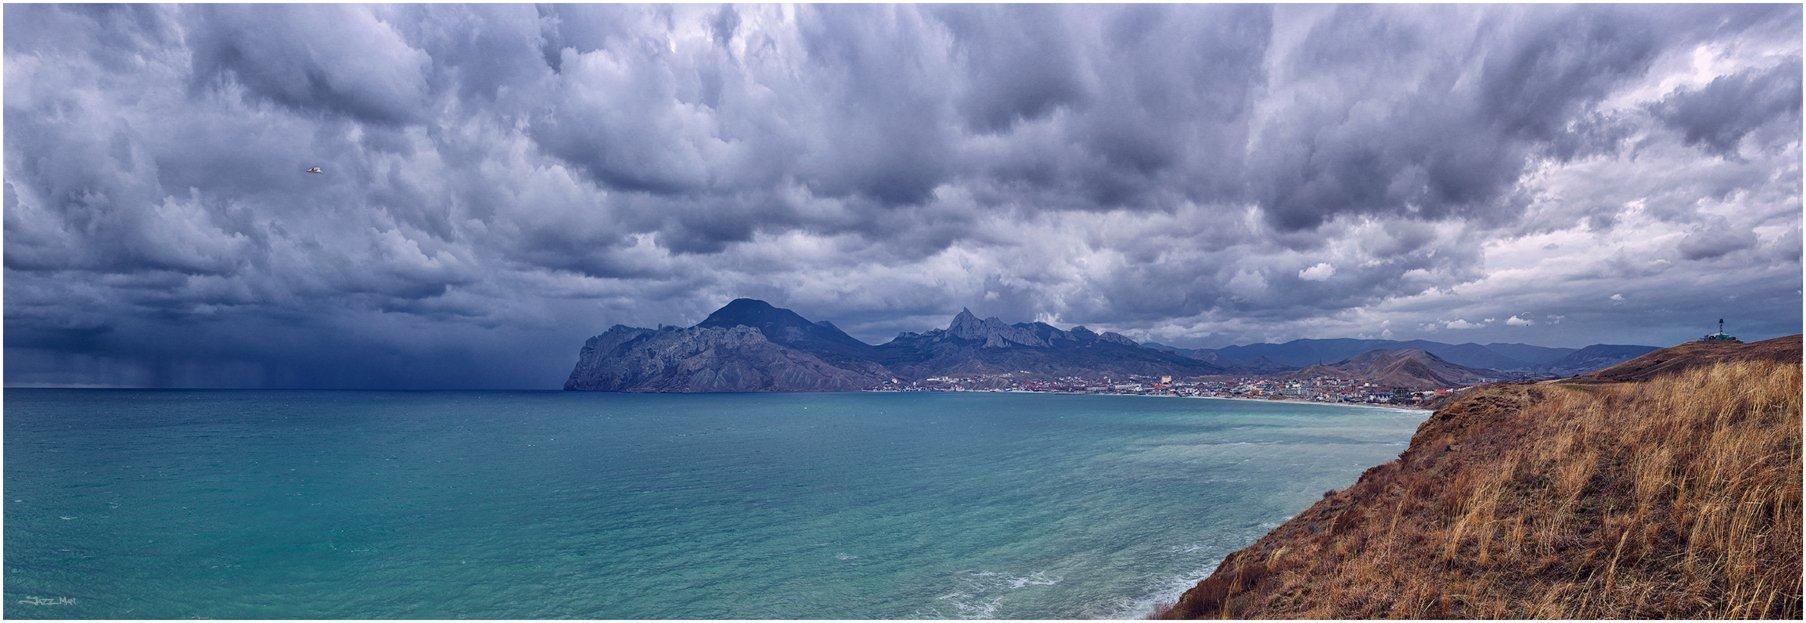 Горы, Гроза, Дождь, Коктебель, Крым, Море, Облака, Панорама, Тучи, Черное море, Jazz Man